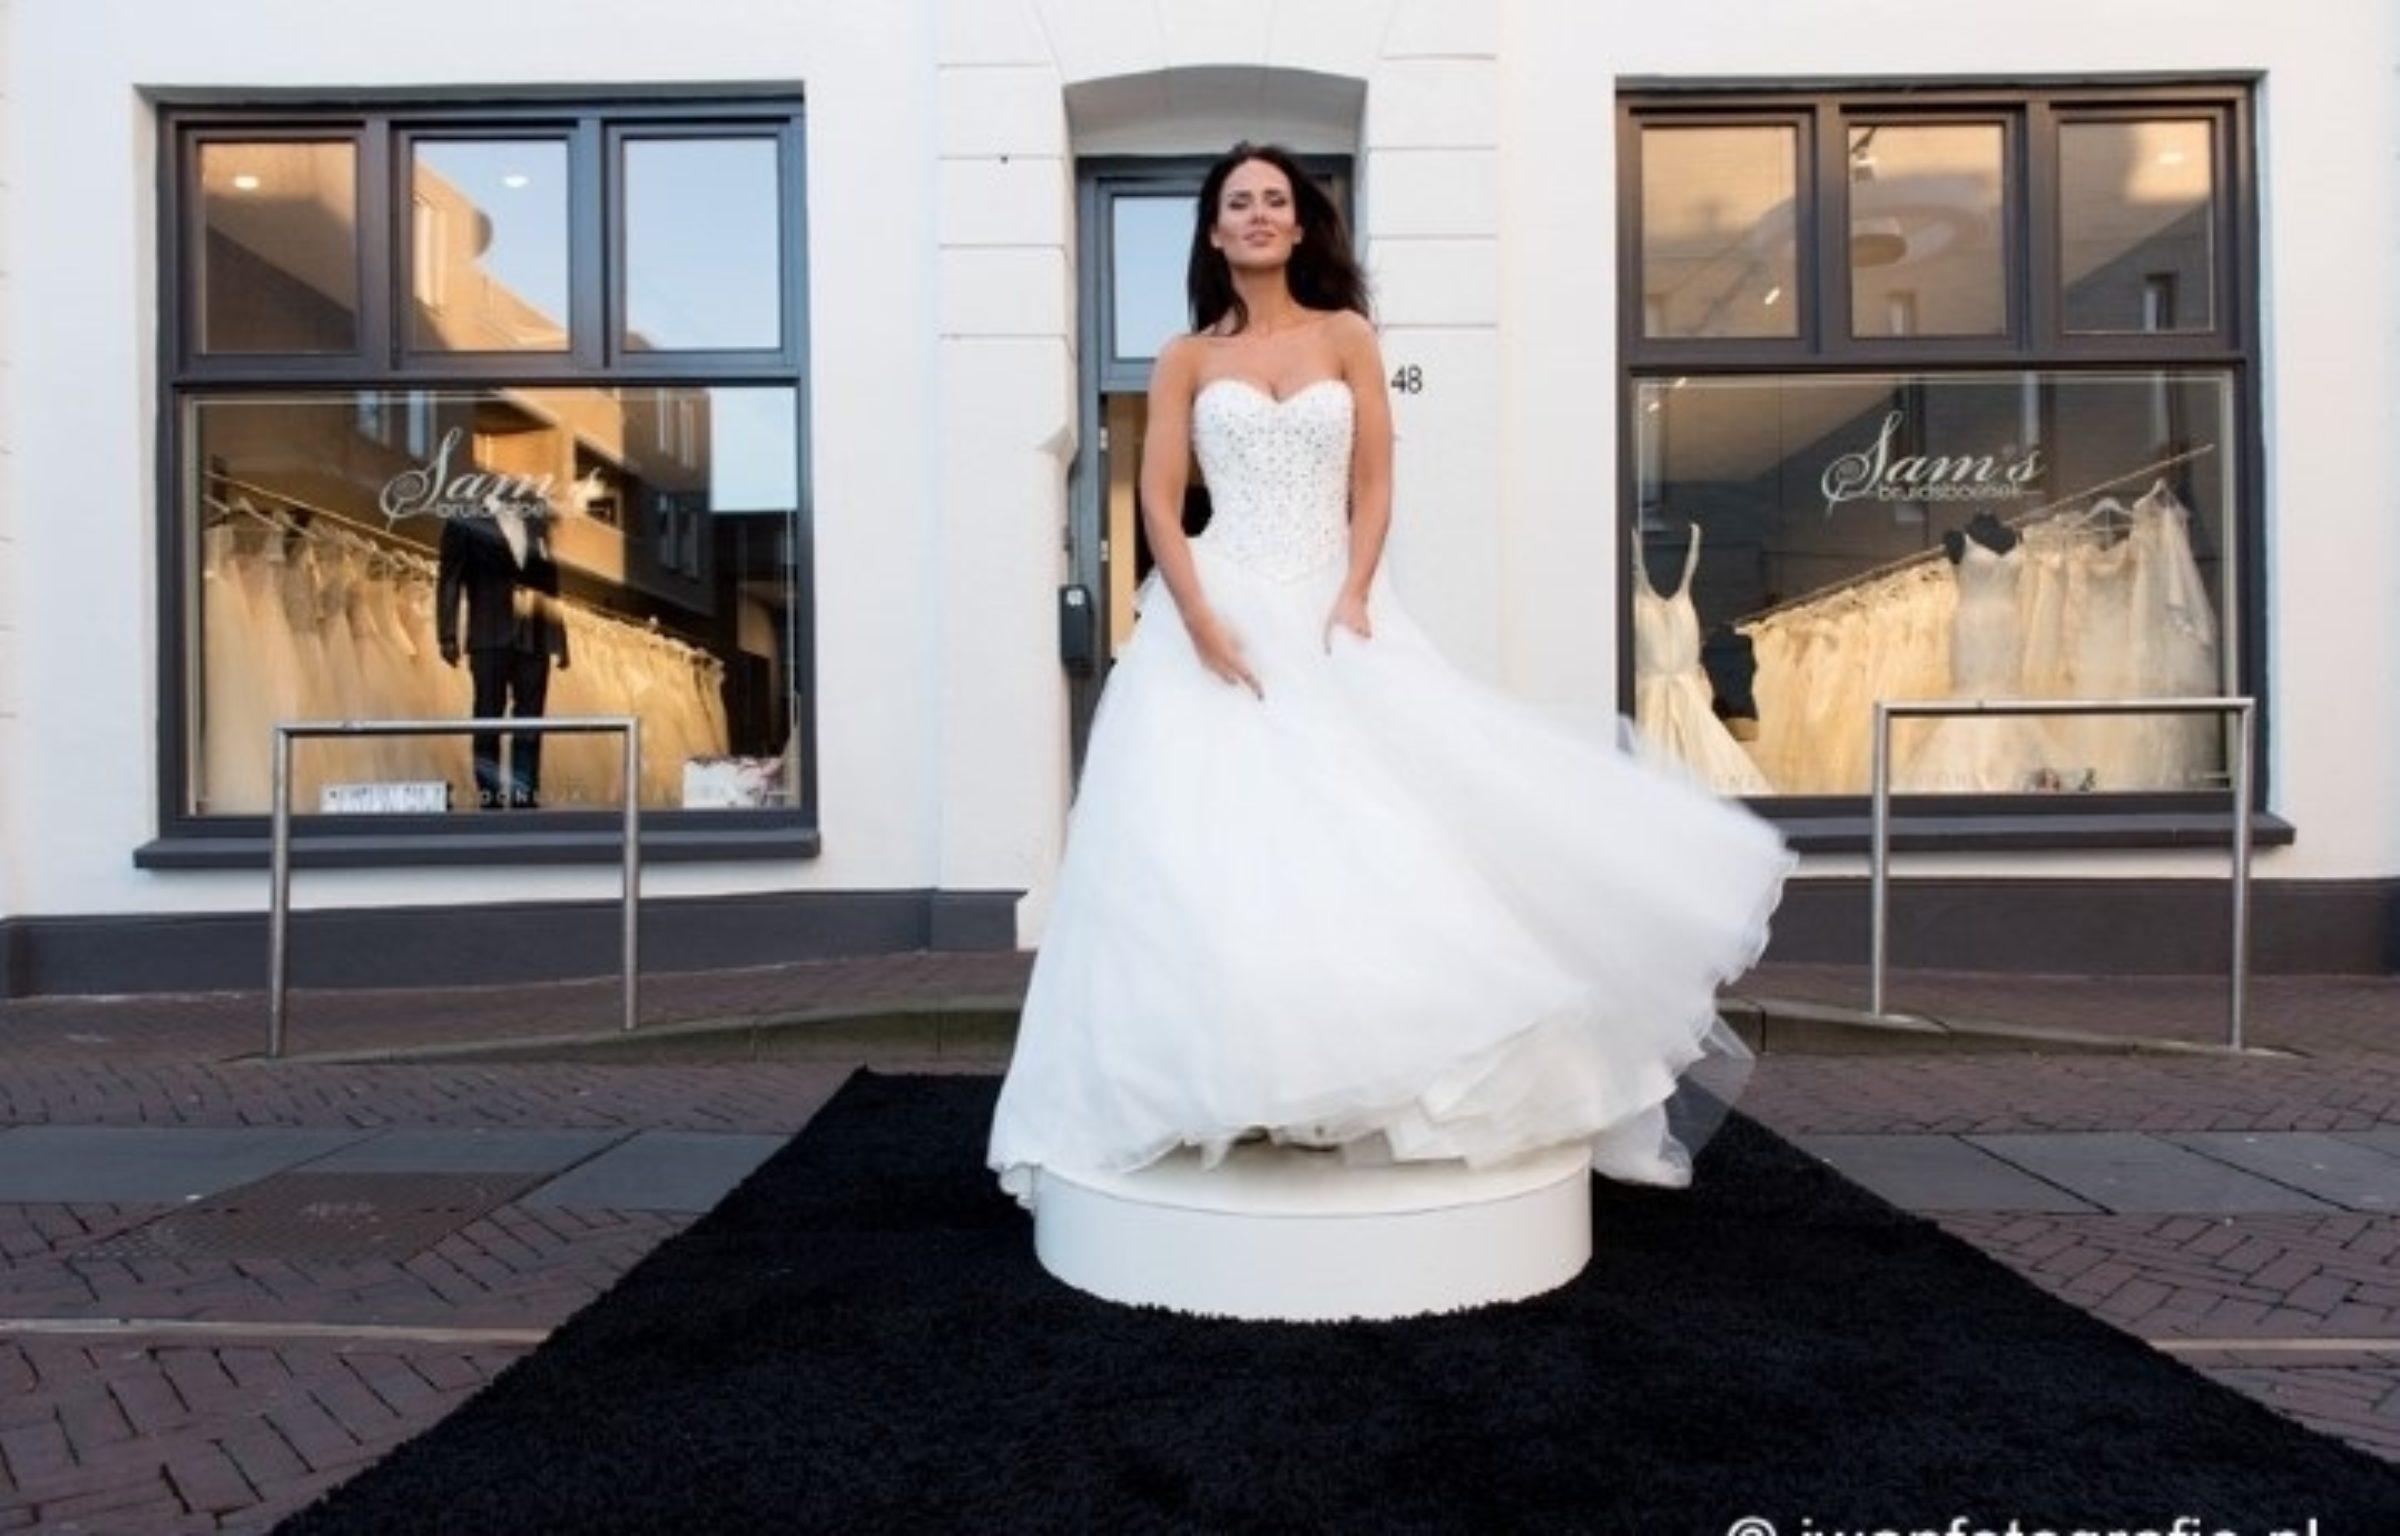 Sam's Bruidsboetiek Enschede